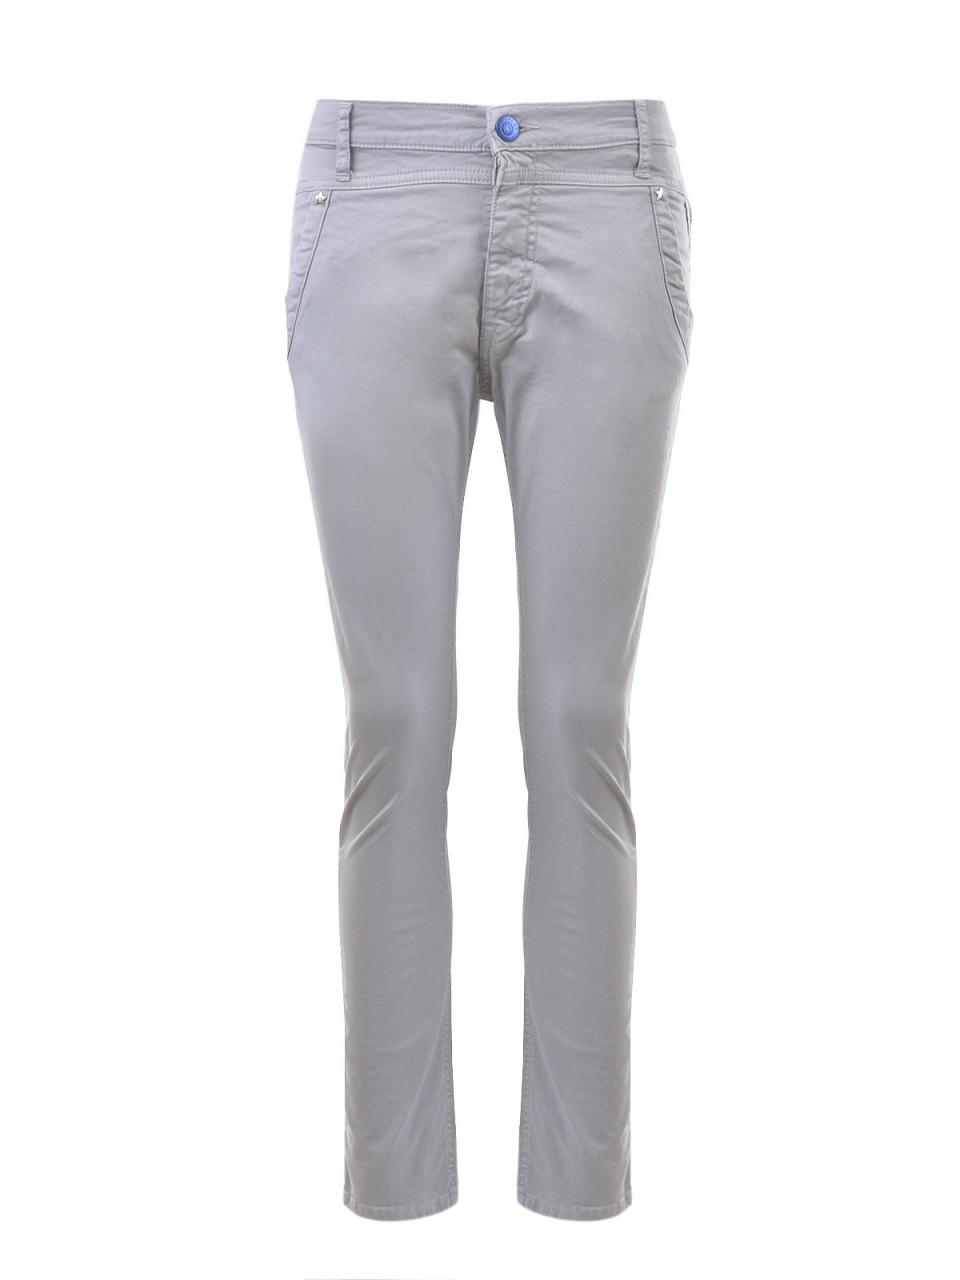 replay-damen-jeans-grau